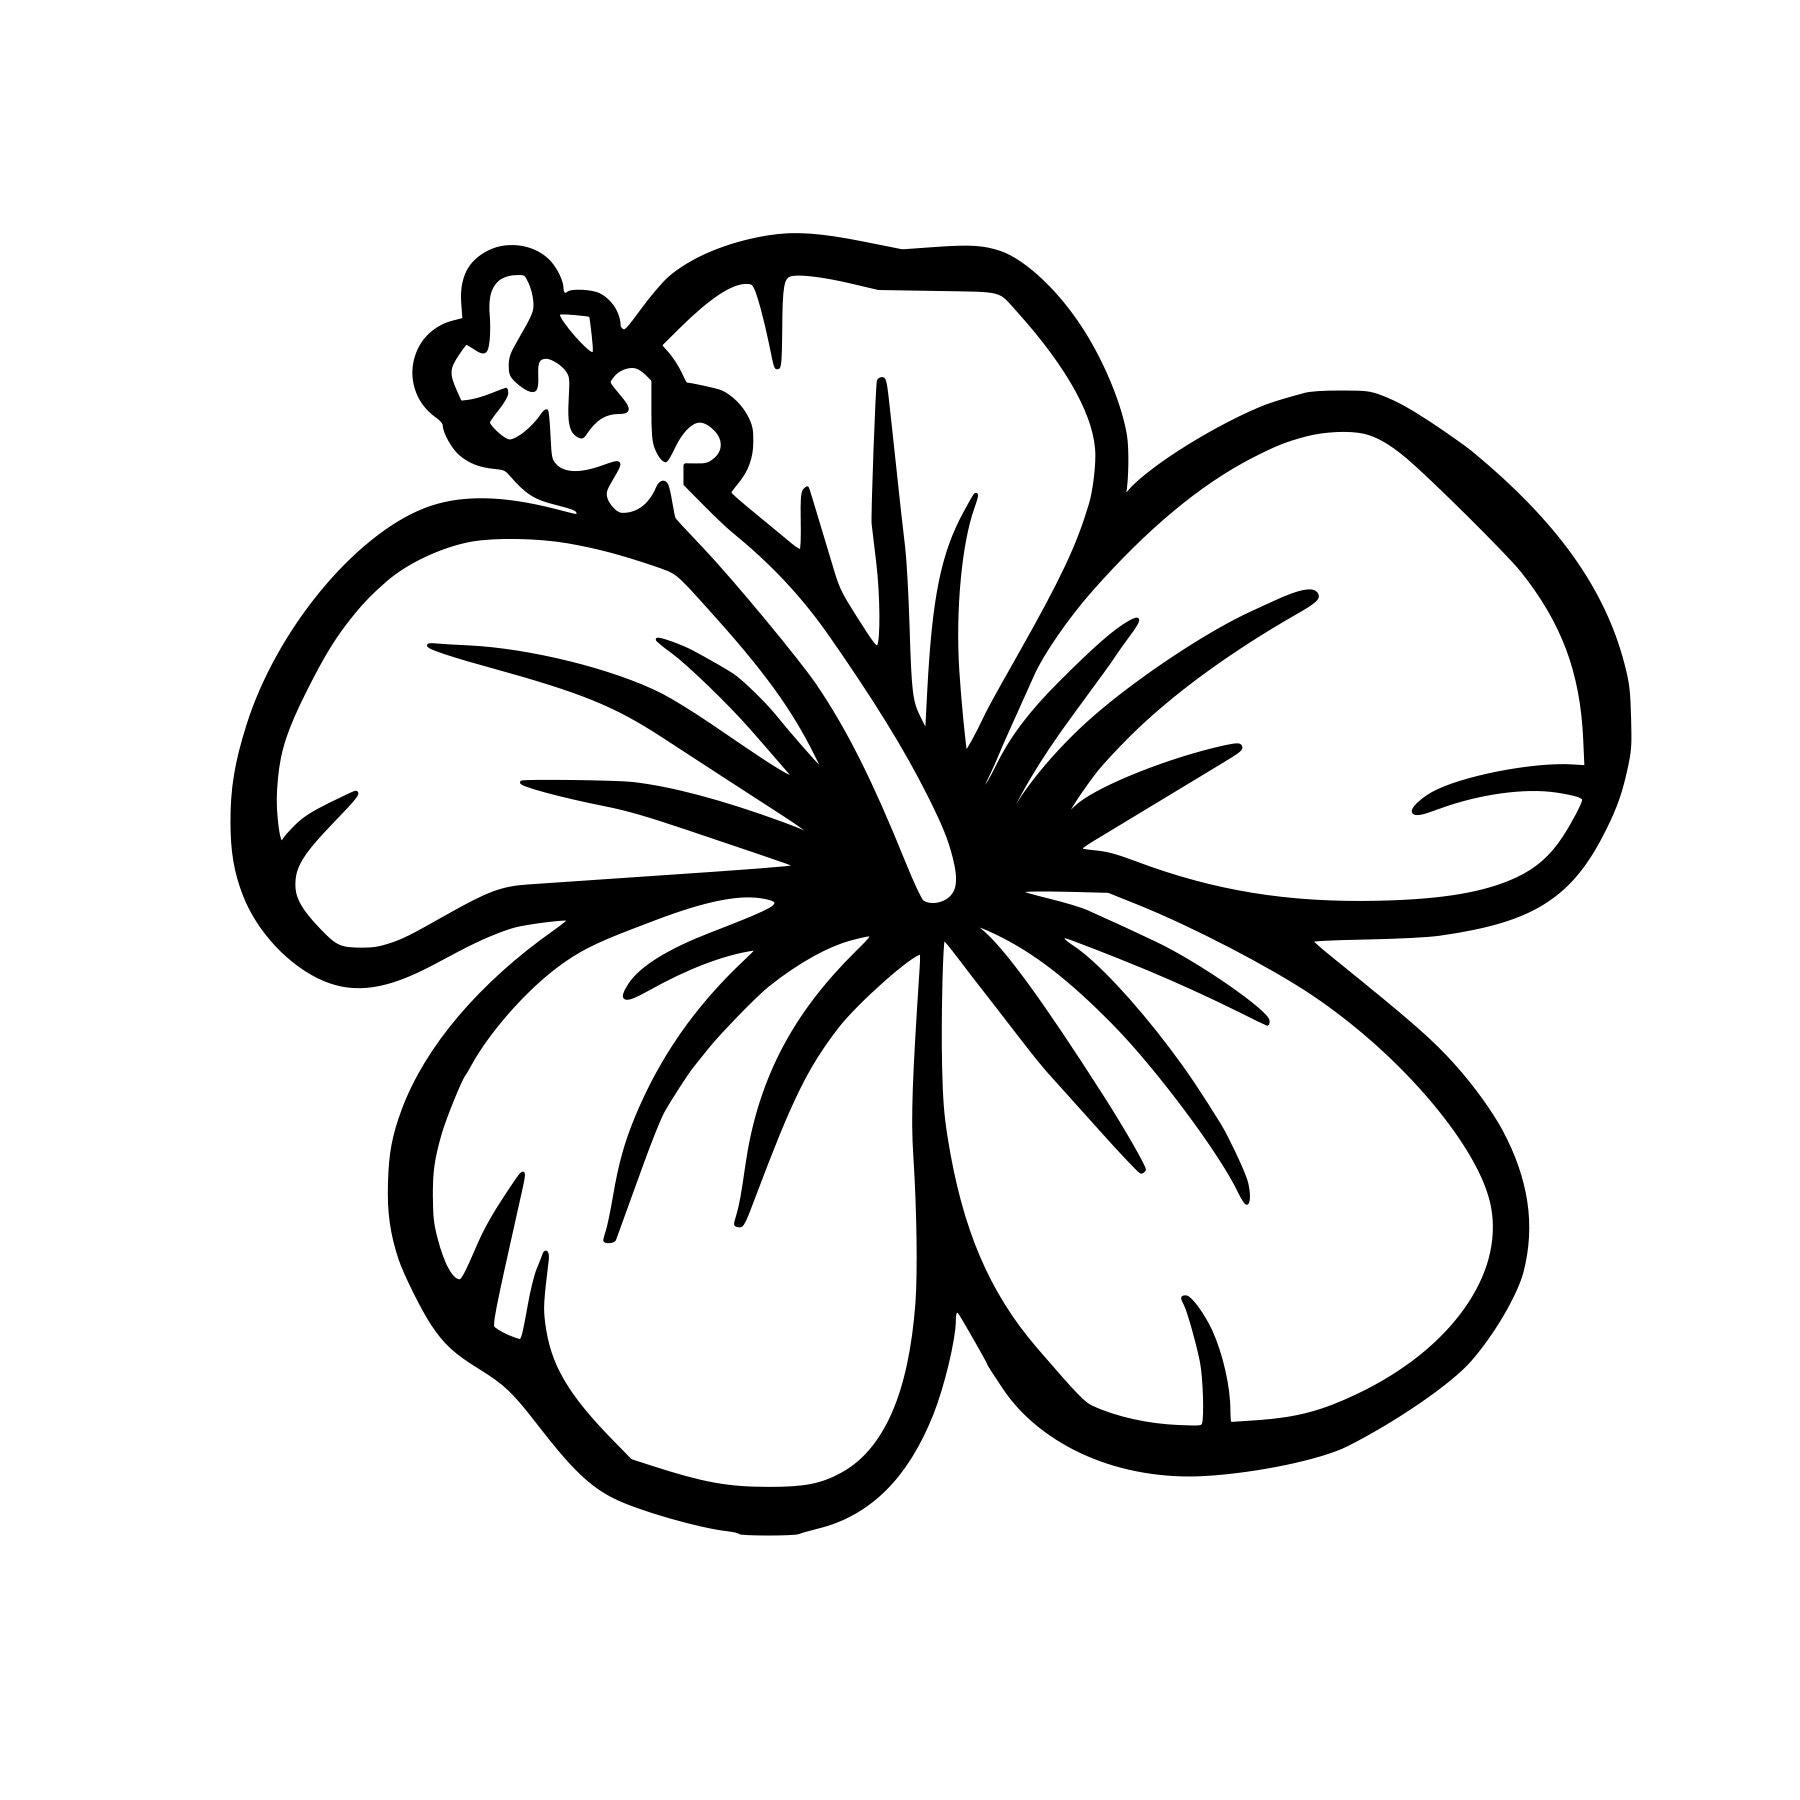 Ohana hibiscus flower vinyl decal any color any size etsy image 0 image 1 izmirmasajfo